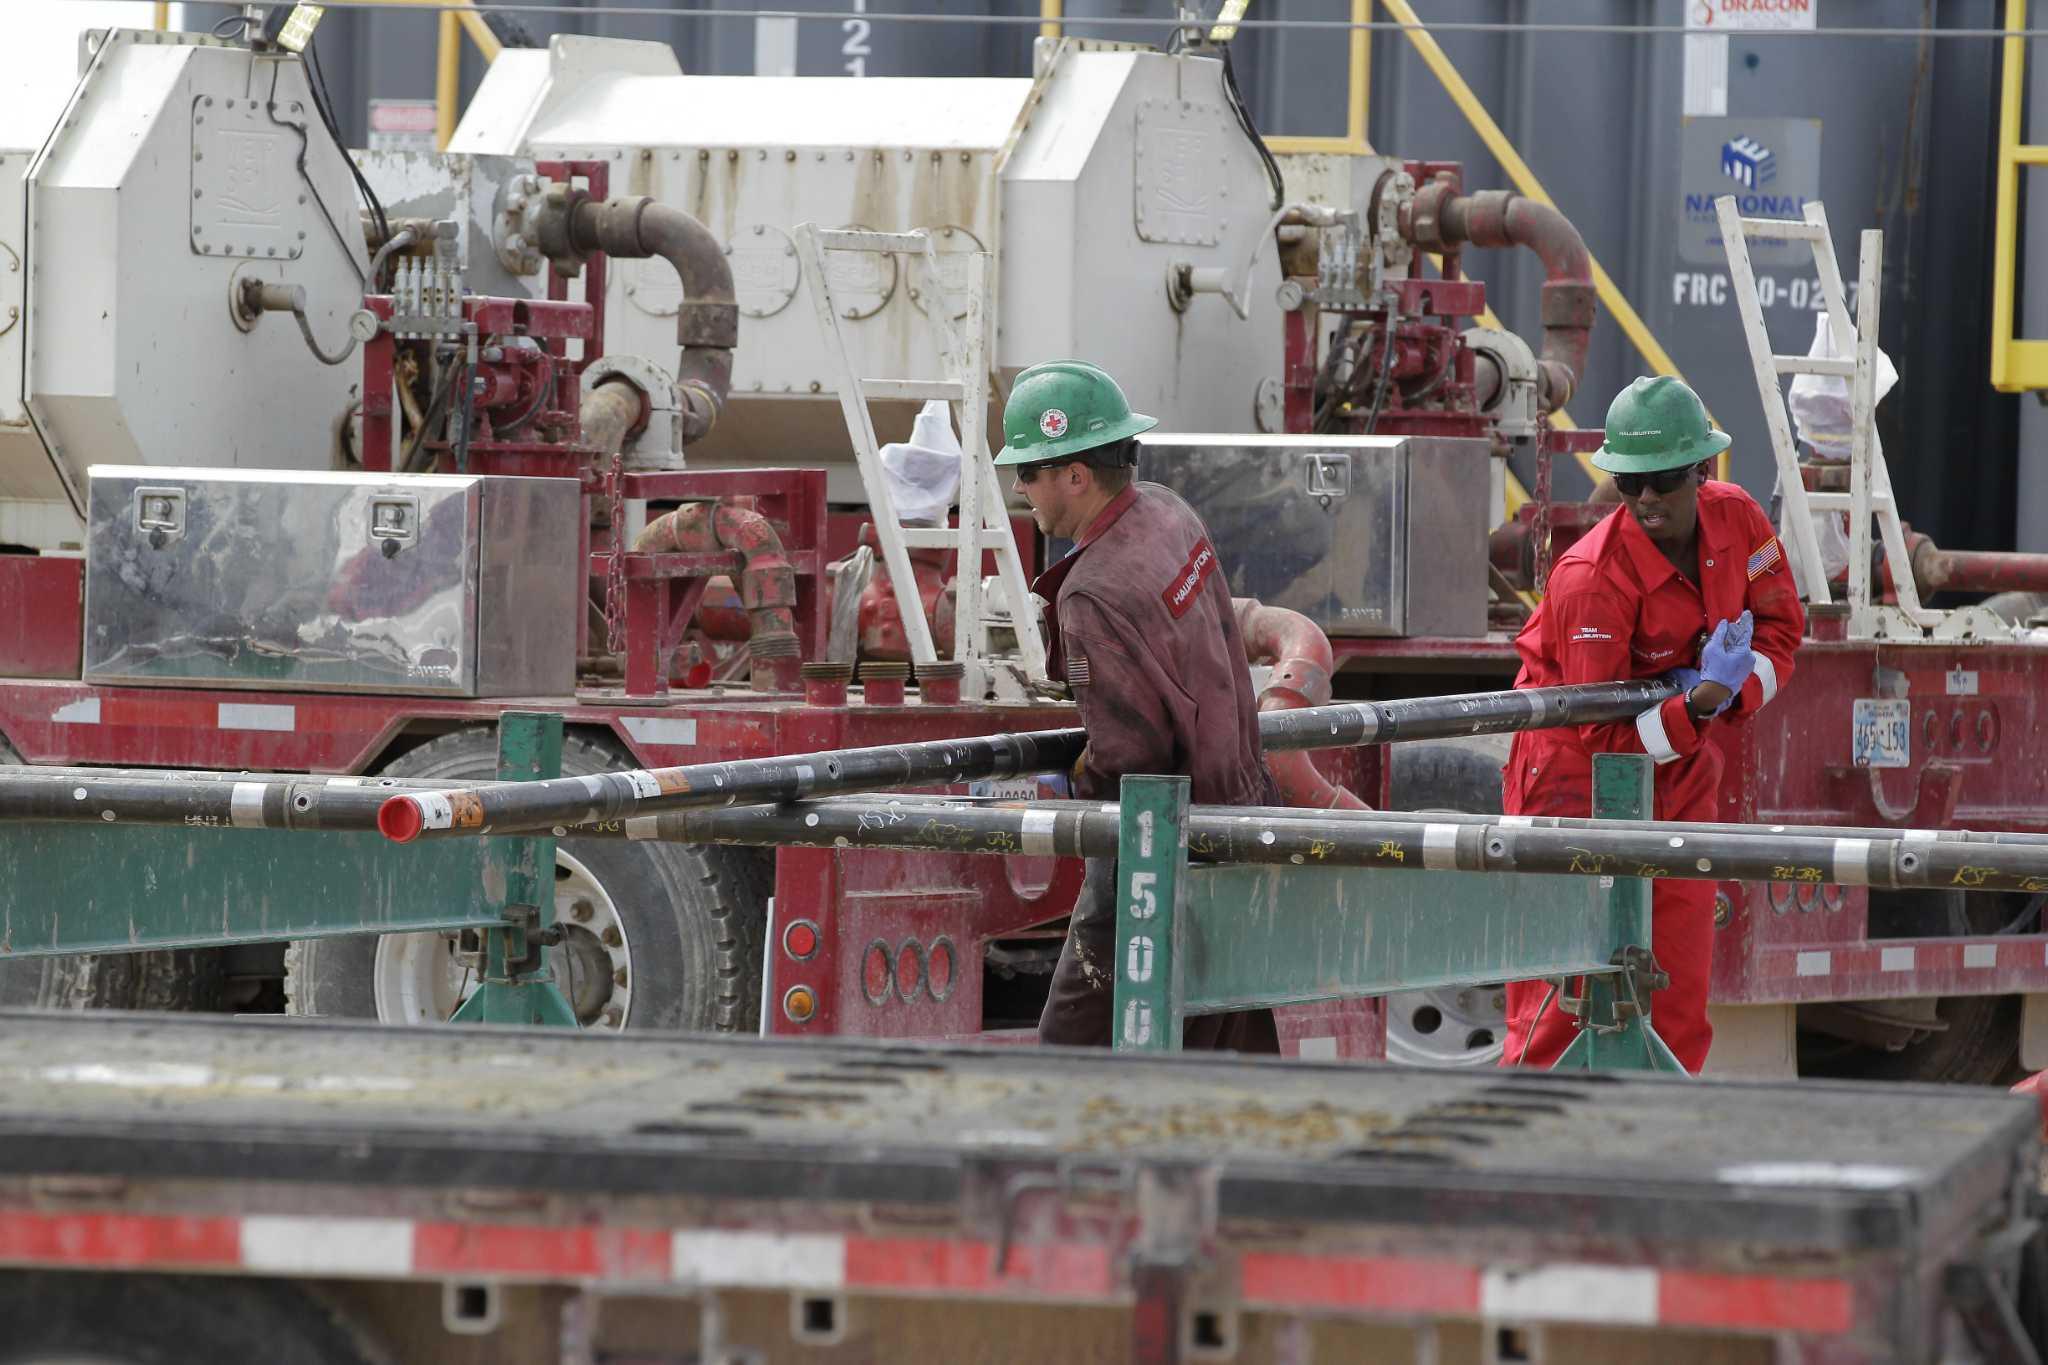 Halliburton to lay off dozens in California